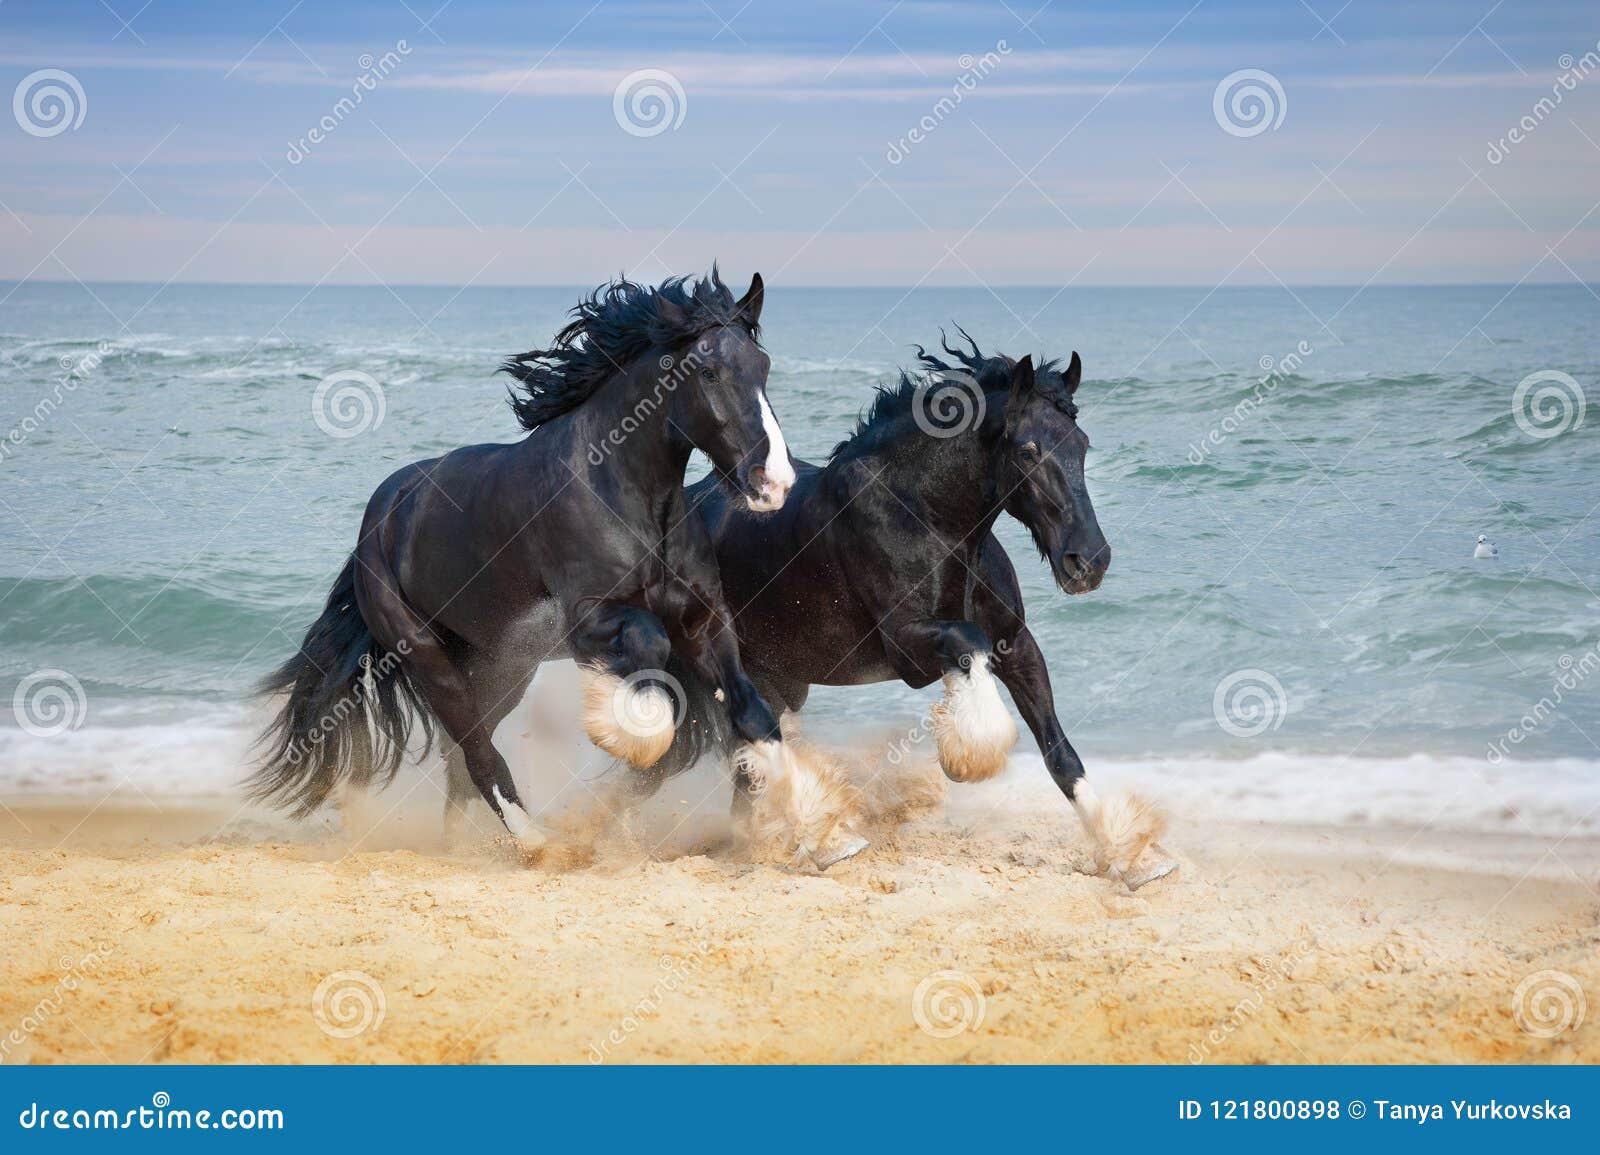 Two beautiful big horses breed Shire